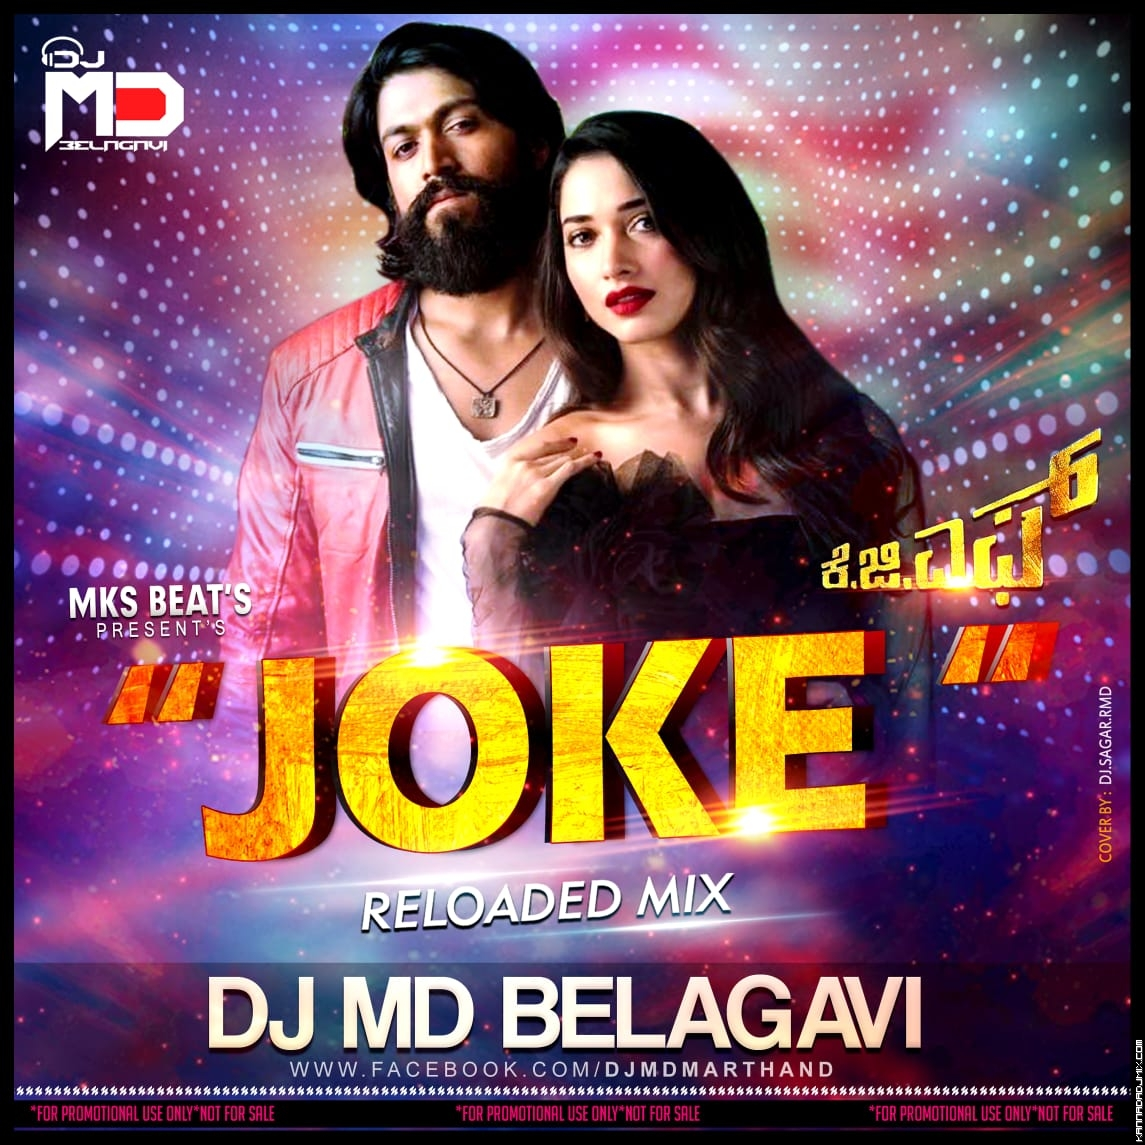 JOKE EDM RELOADED REMIX   [DJ MD BELAGAVI  FT MKS  BEATS].mp3